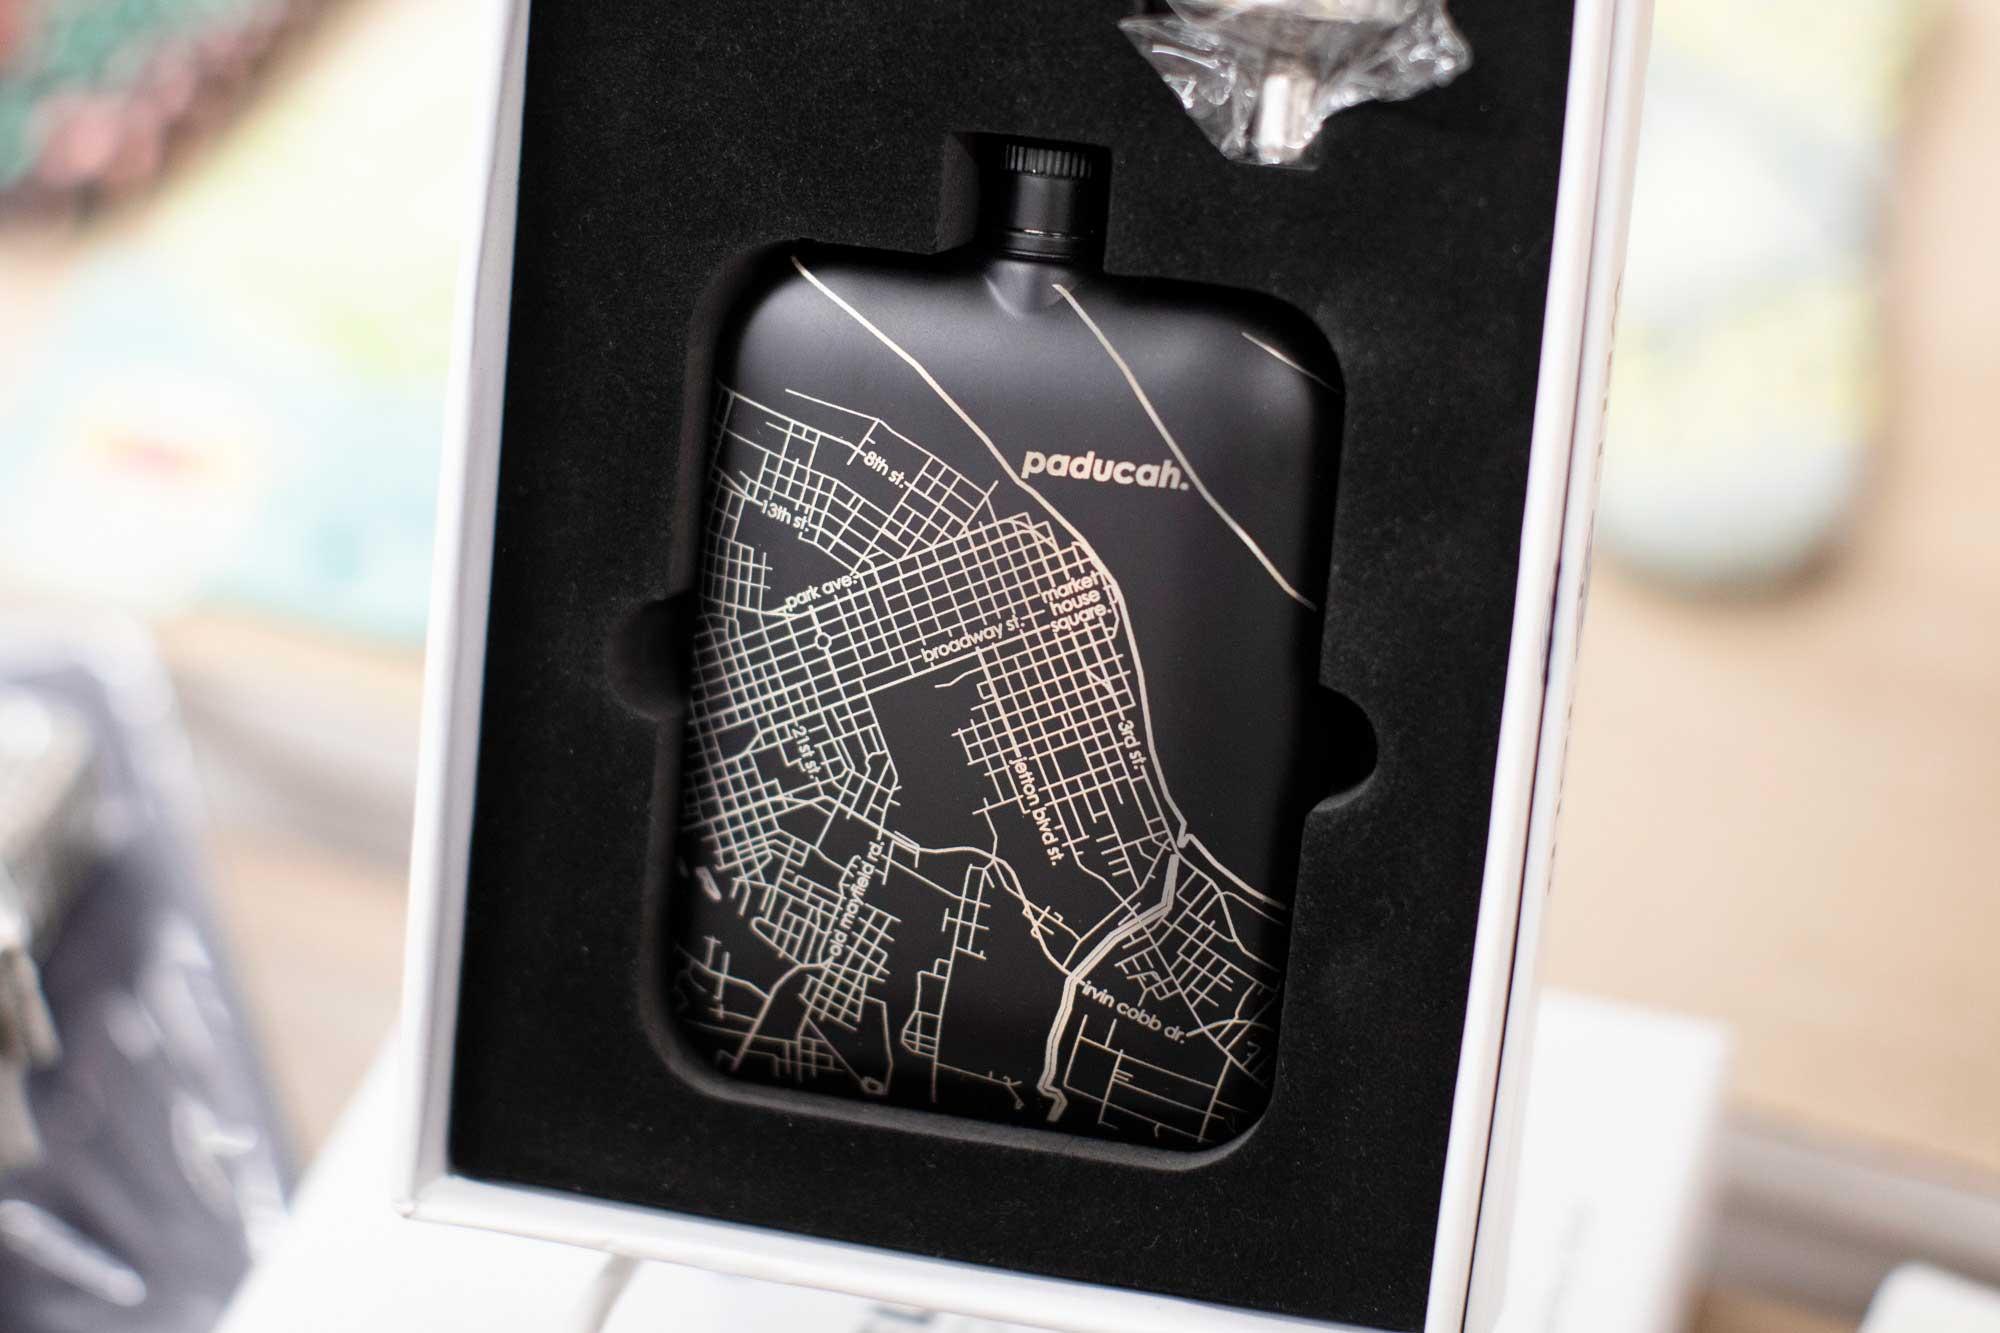 Paducah map flask